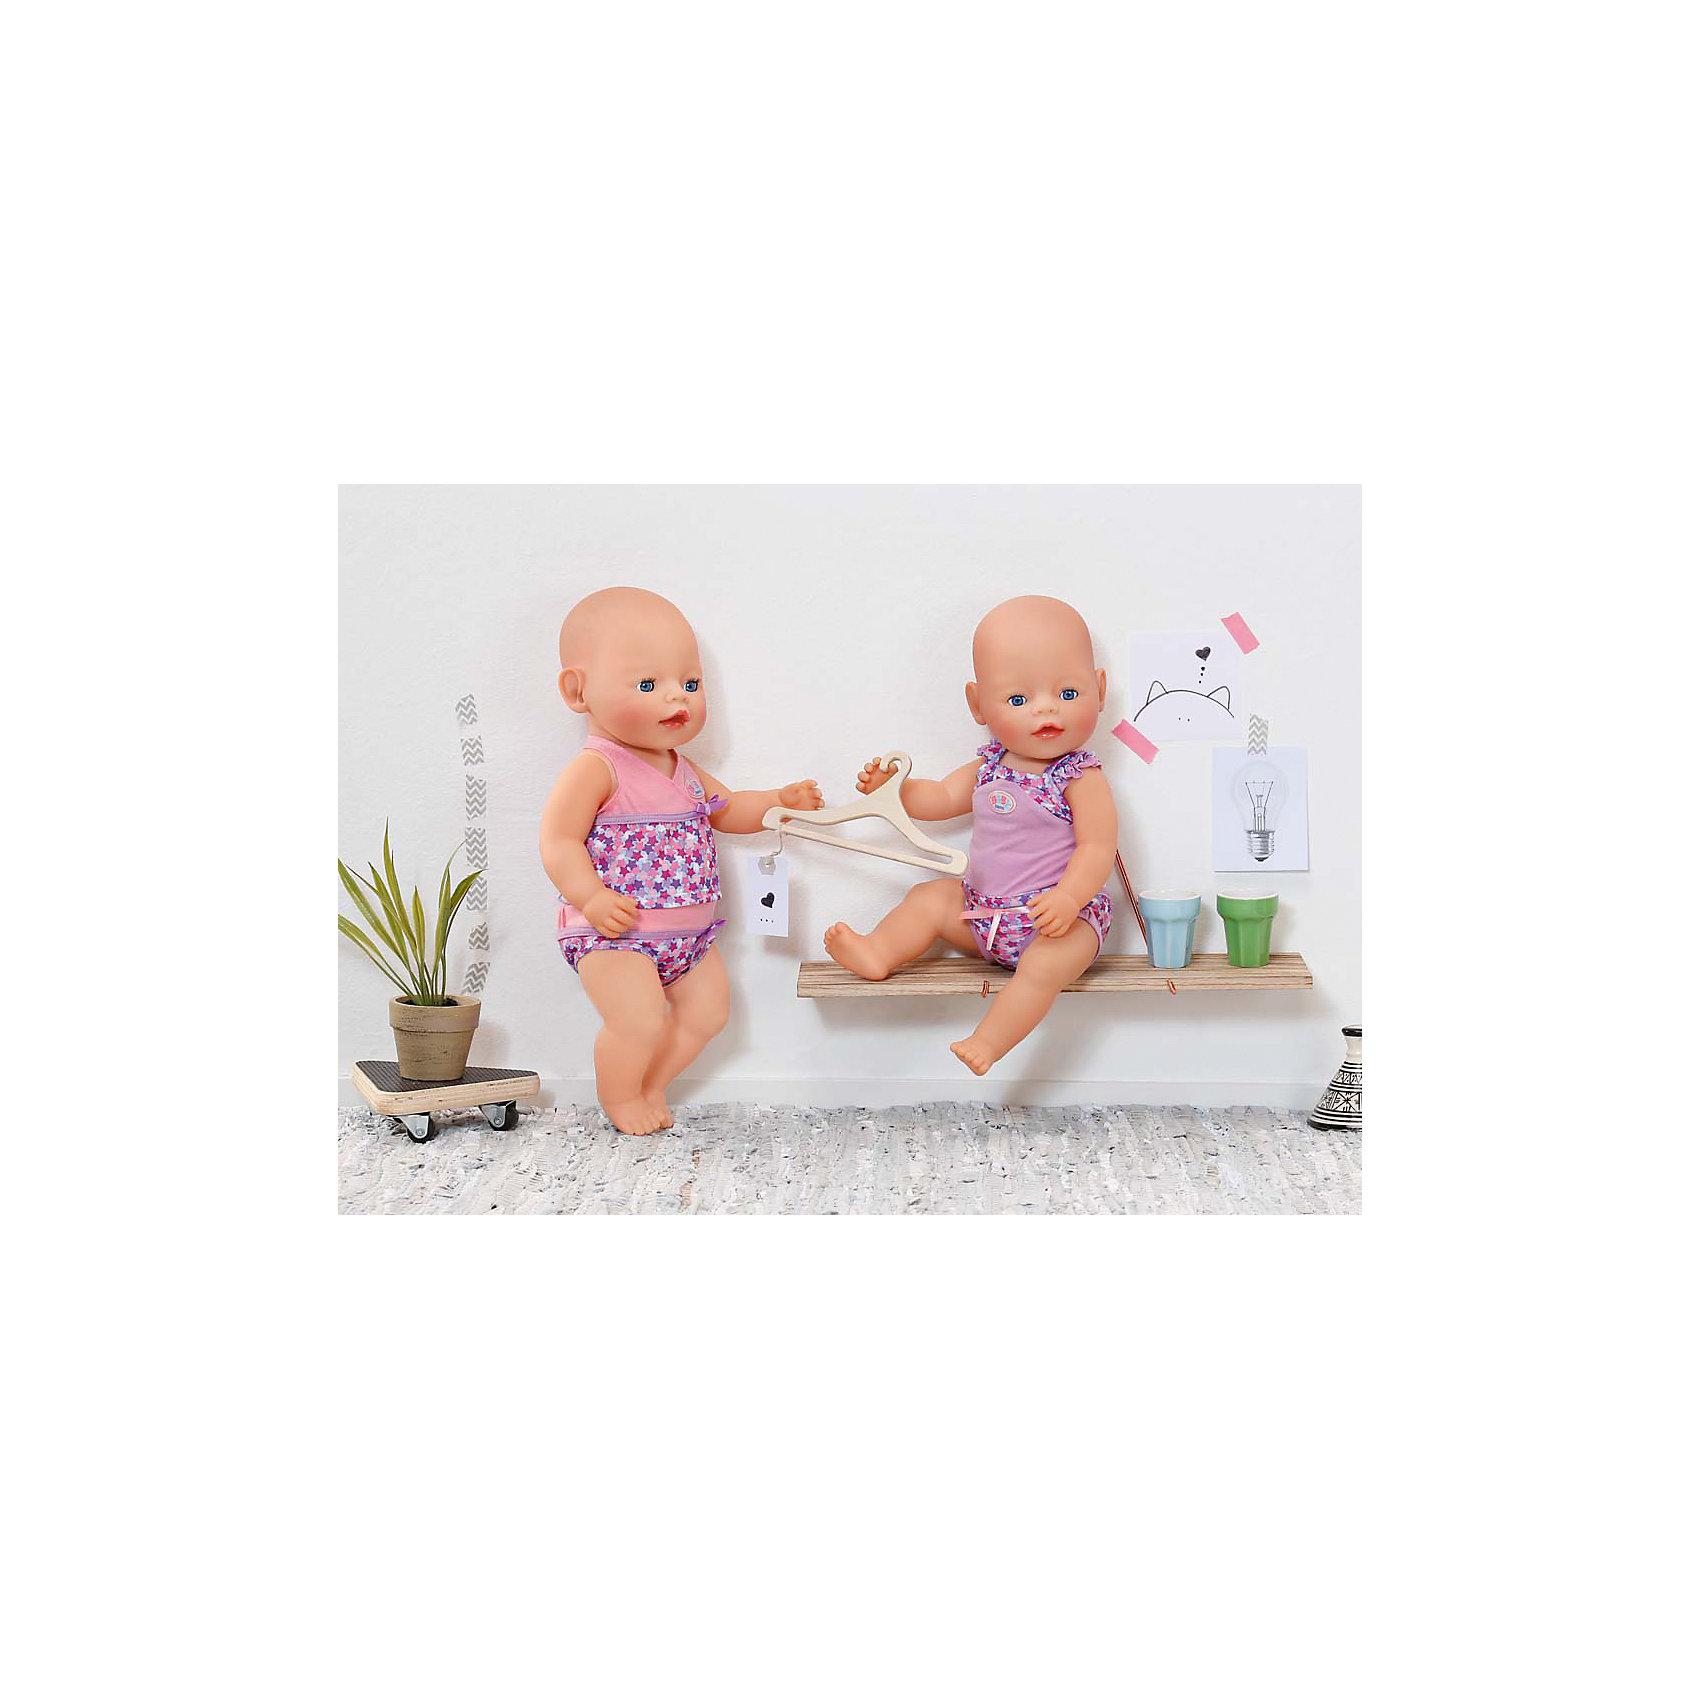 Zapf Creation Нижнее белье, розово-фиолетовый, BABY born zapf creation нижнее белье белый baby annabell